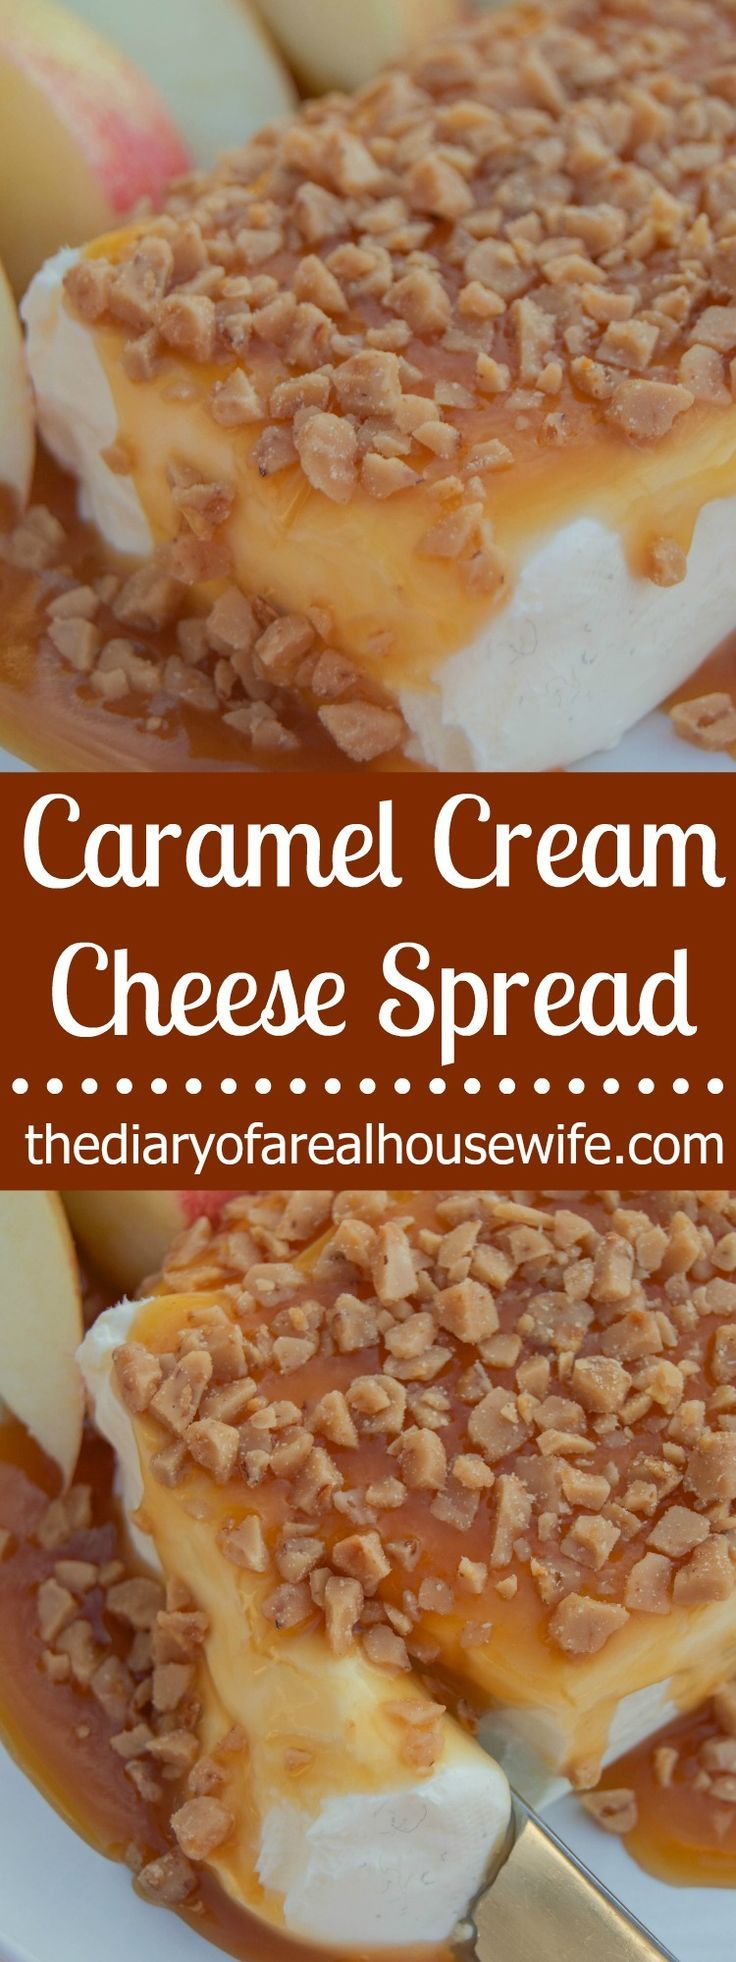 Super Easy Caramel Cream Cheese Spread